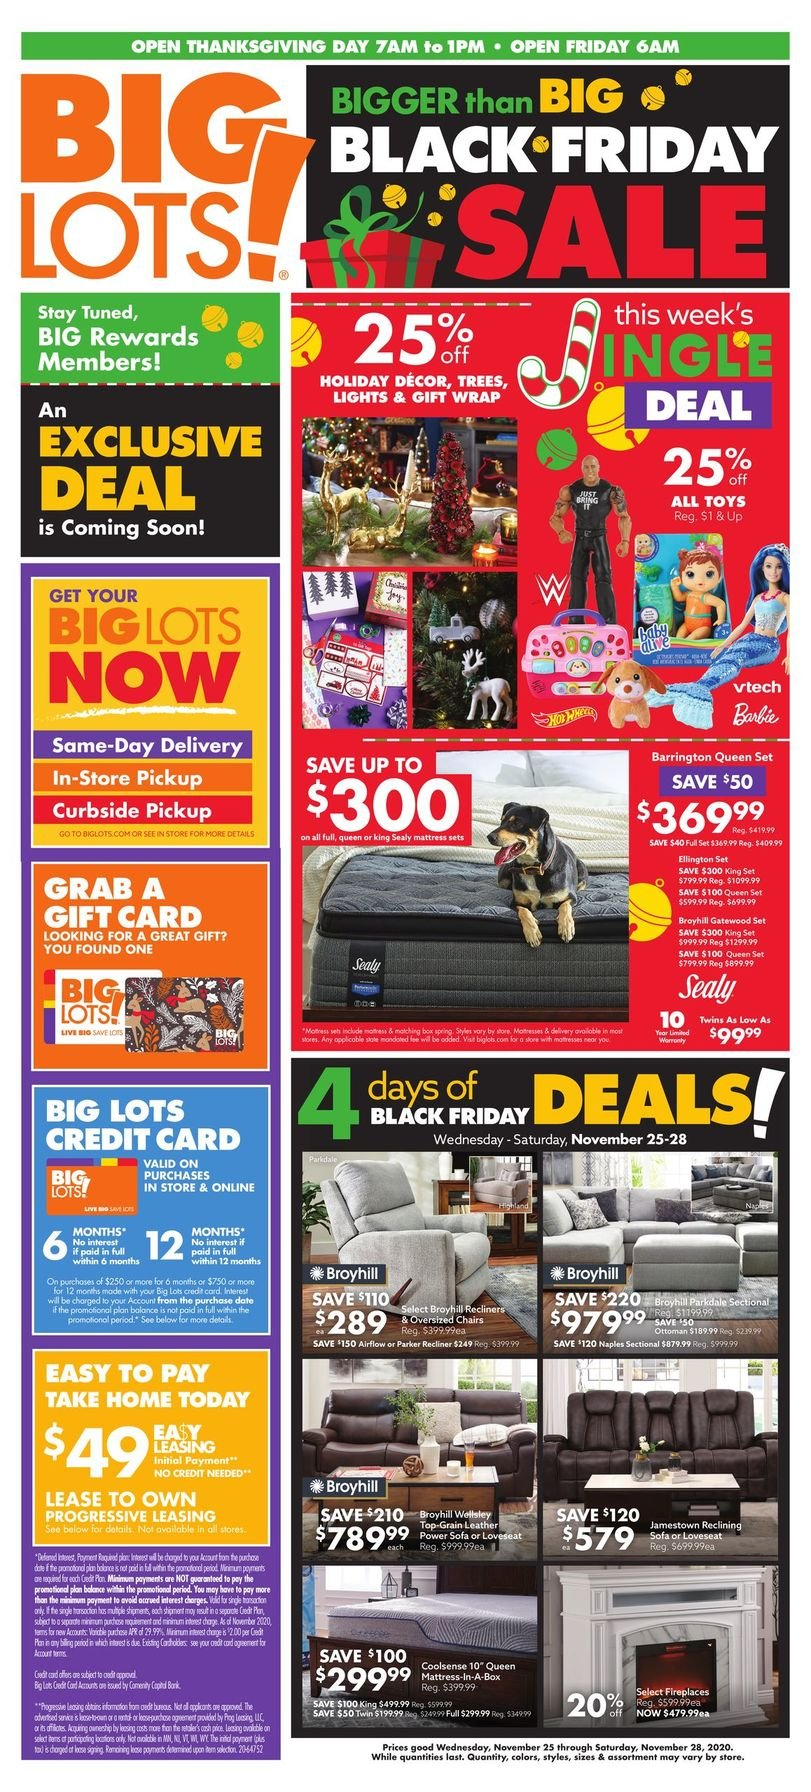 Big Lots Black Friday 2020 Page 13